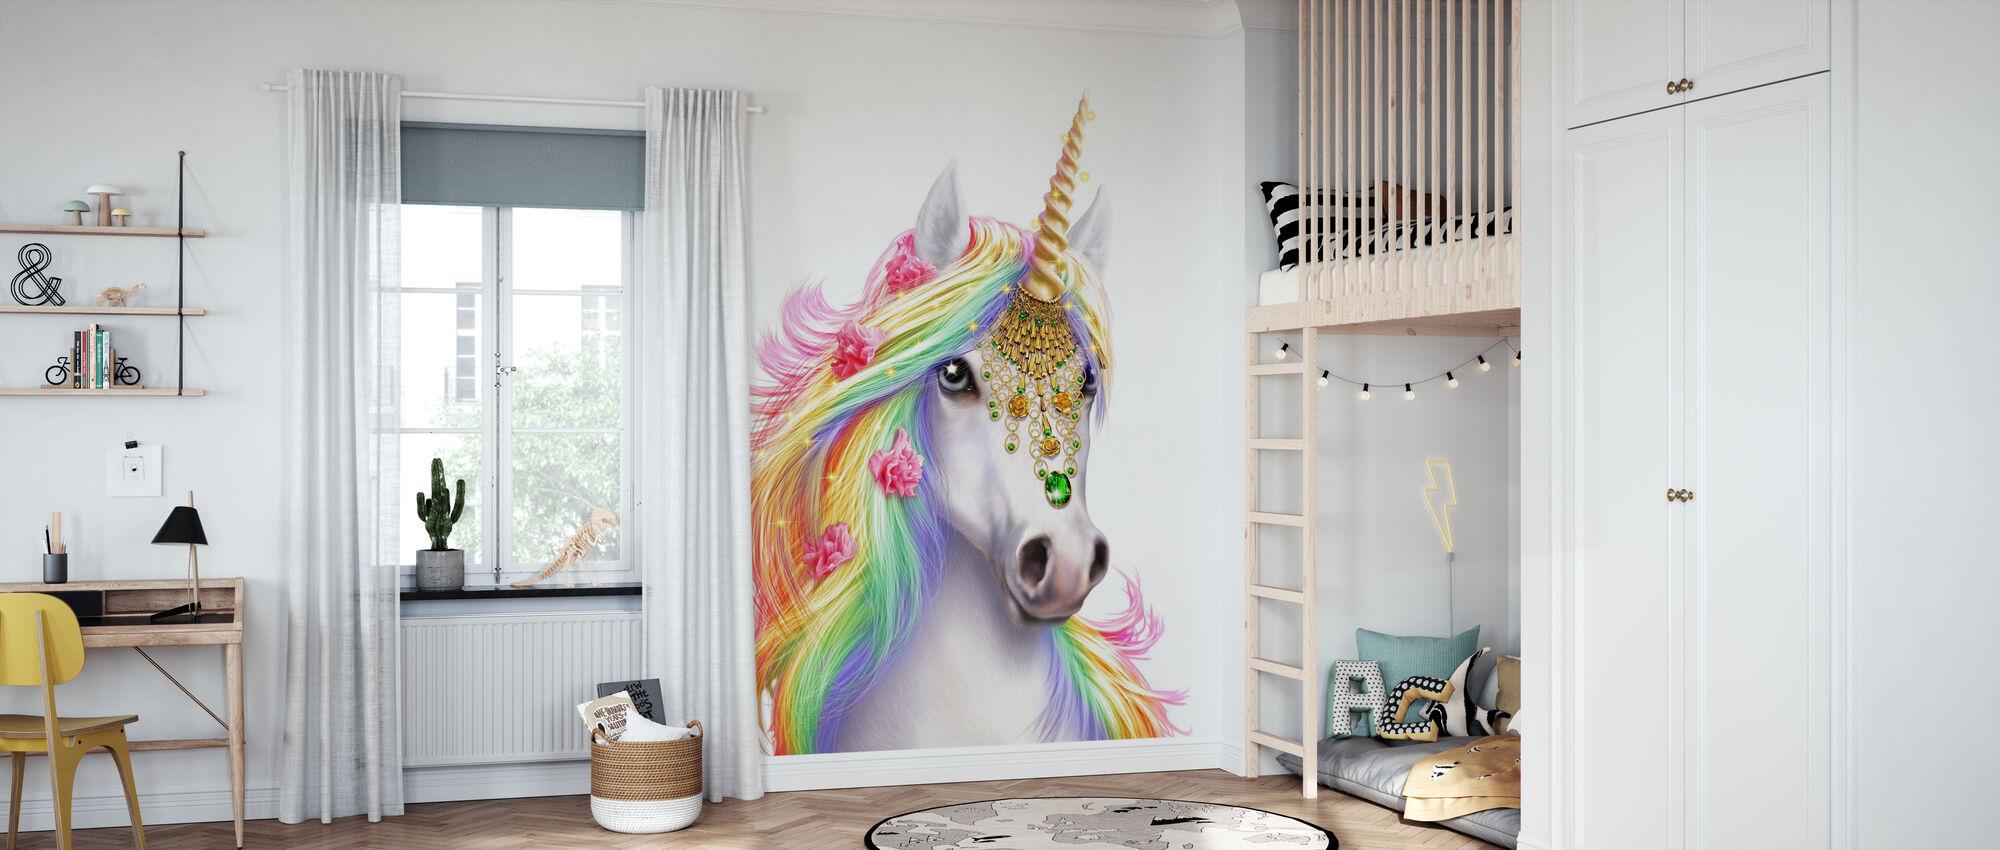 Unicorn - Wallpaper - Kids Room